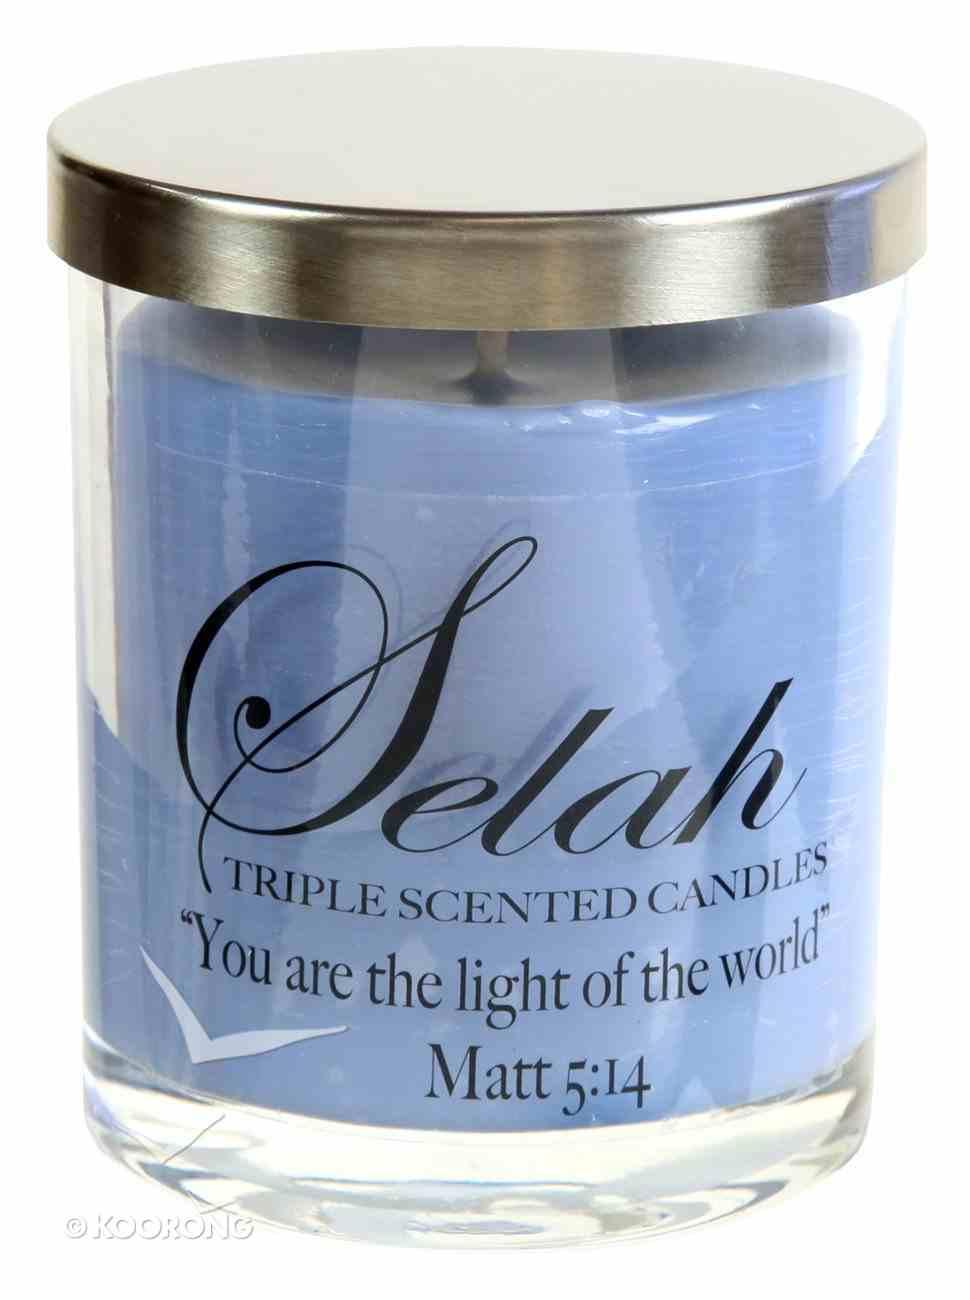 Selah Triple Scented Soy Based Candle: Cologne, Matt 5:14 Homeware